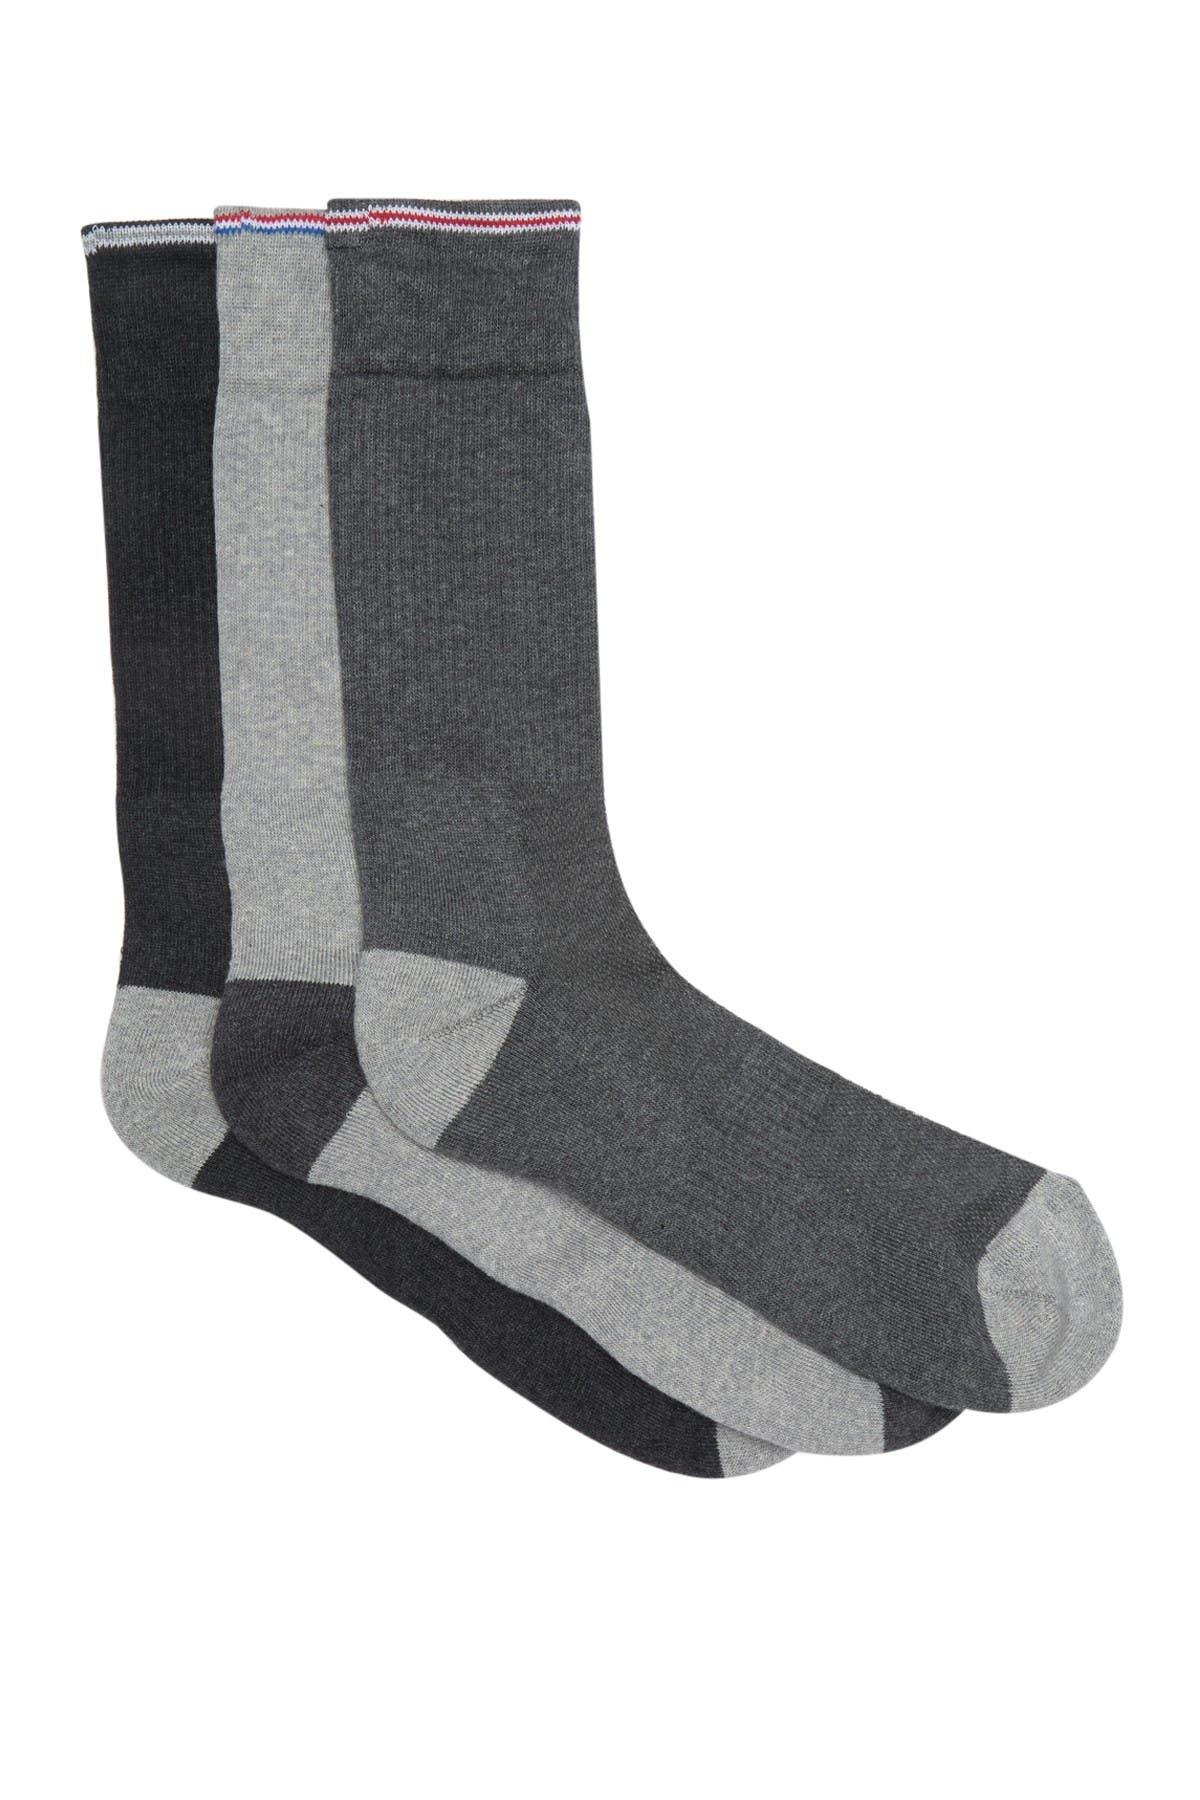 Image of Lorenzo Uomo Stripe Trim Crew Socks - Pack of 3